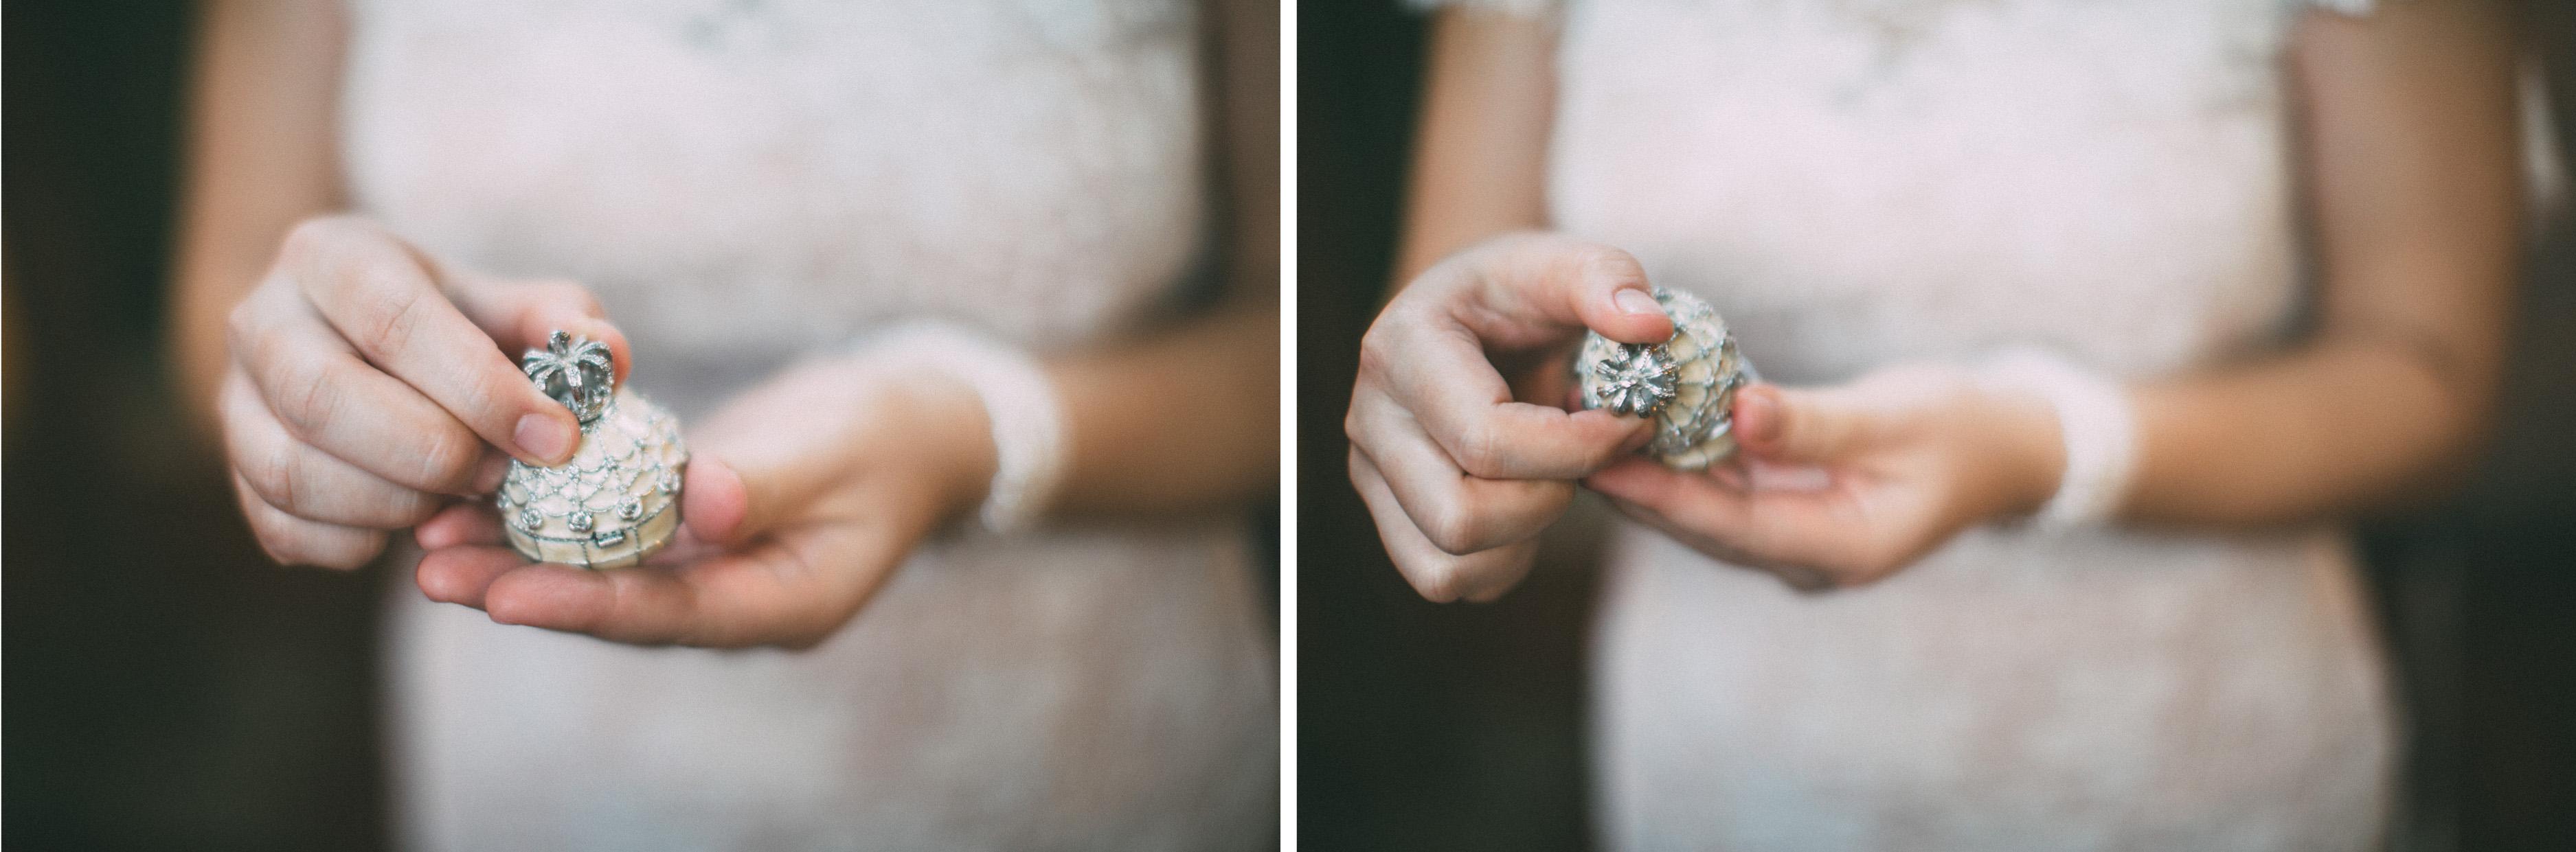 8-hellojanelee-sam grace-malaysia-wedding-day